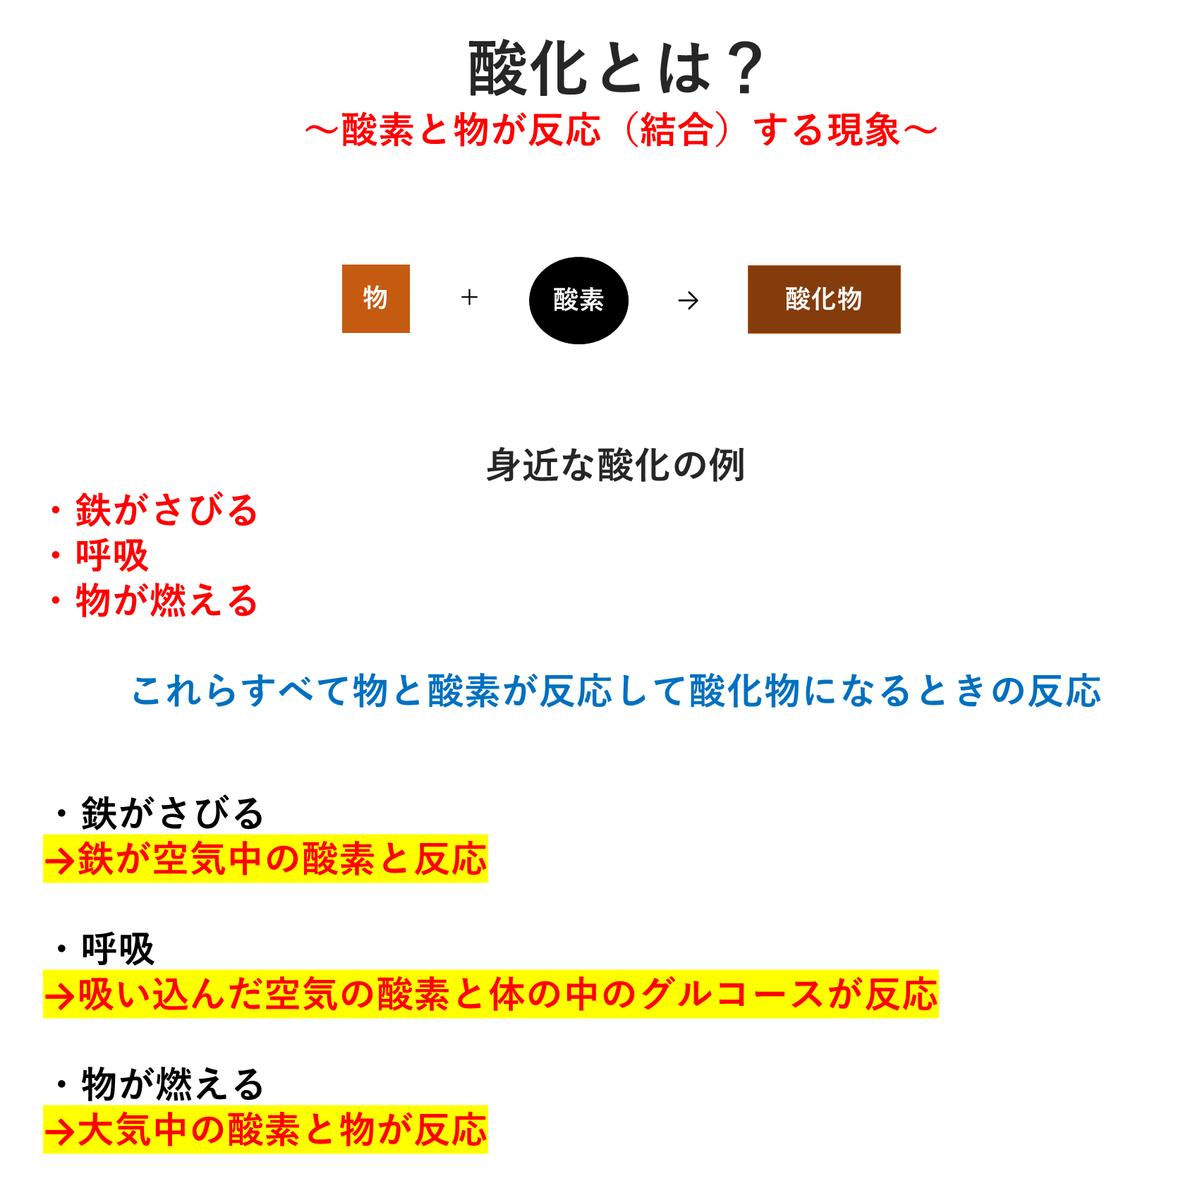 f:id:Think_diary:20210908192041p:plain